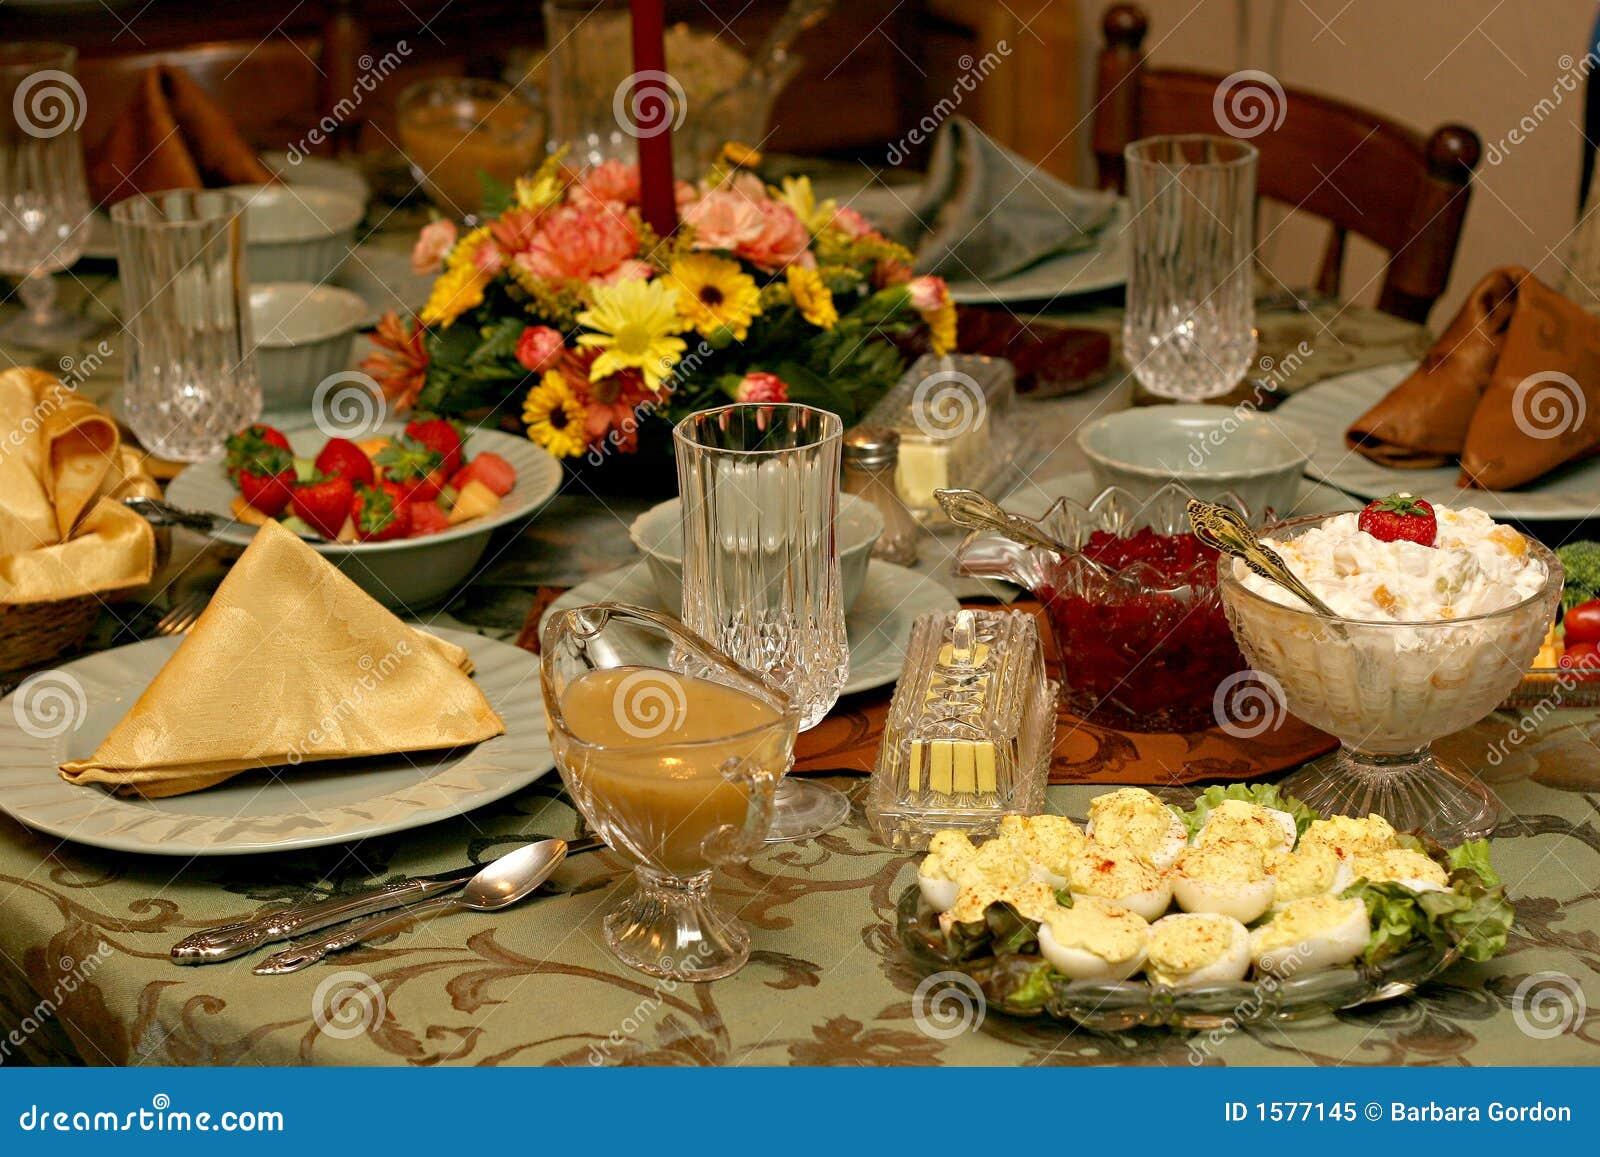 Configuration de Tableau de repas de vacances